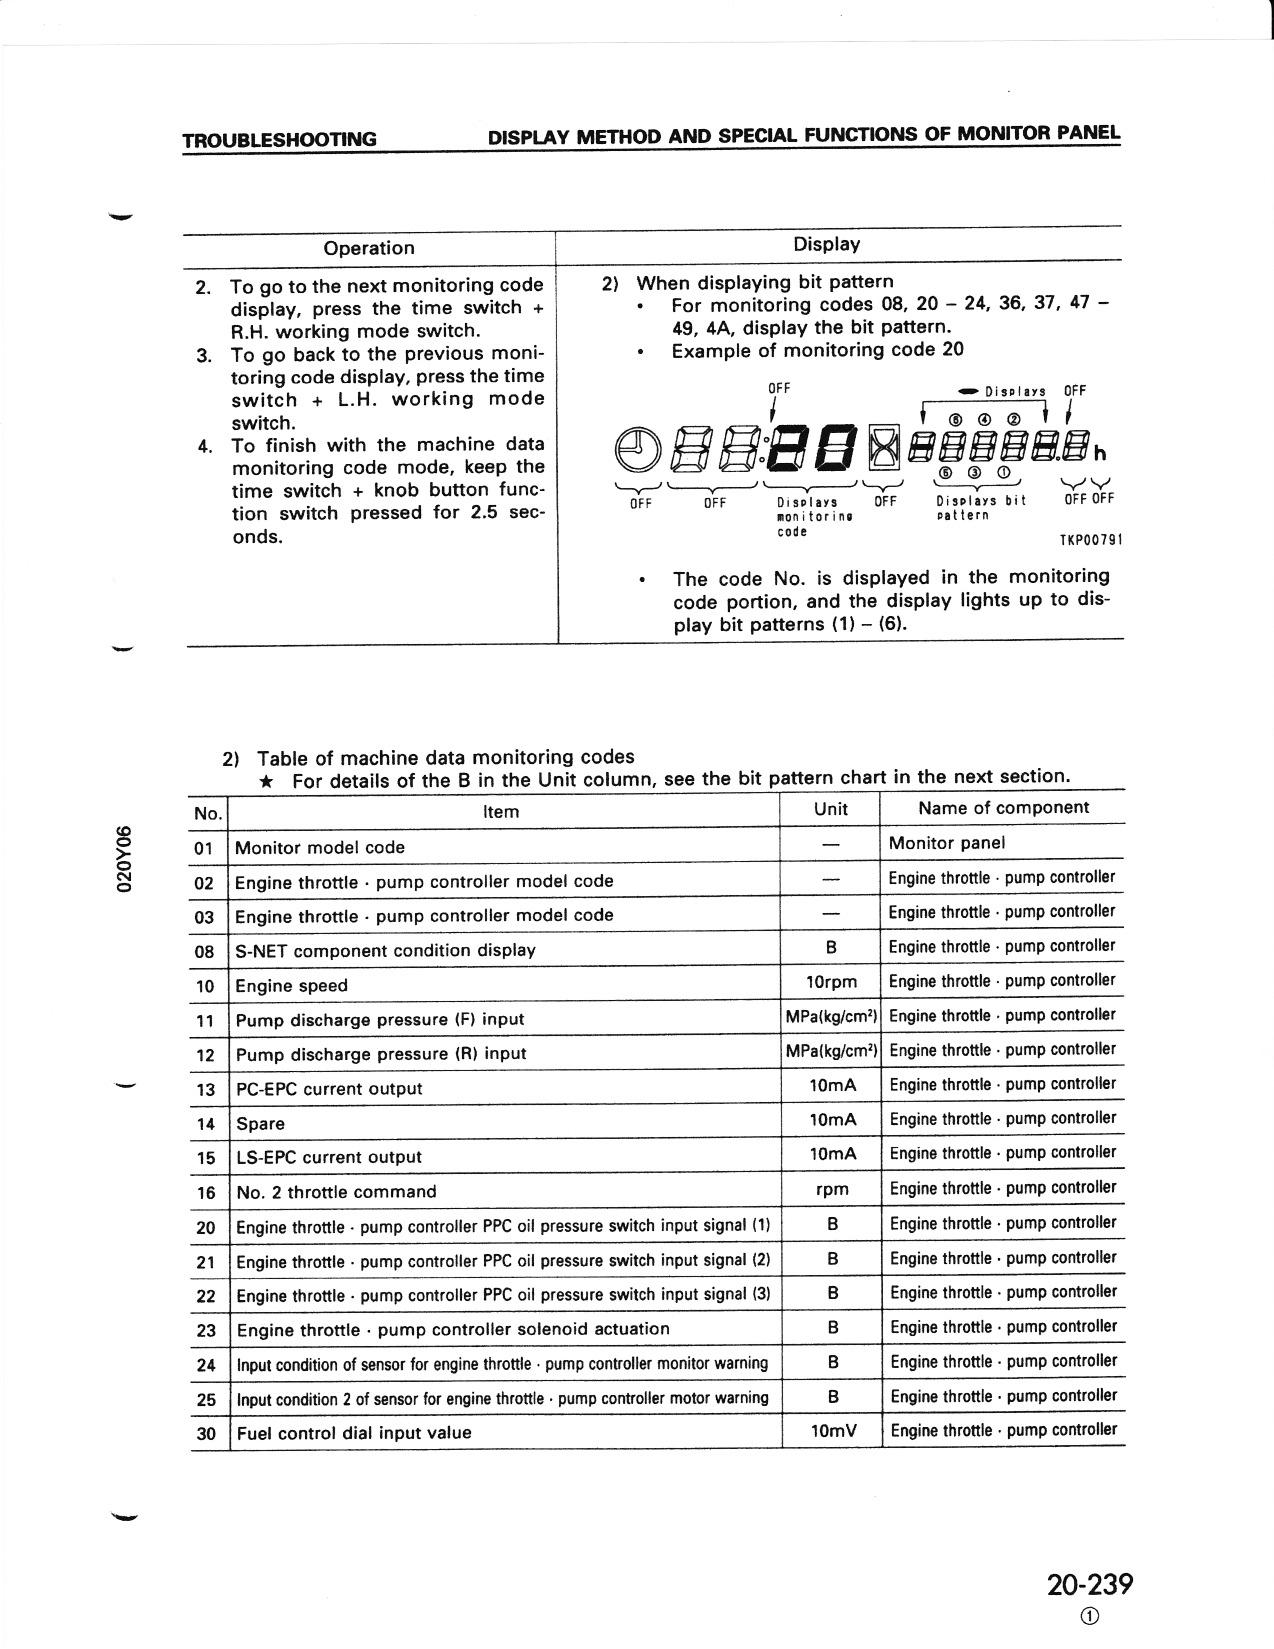 powerflex 4 manual fault codes